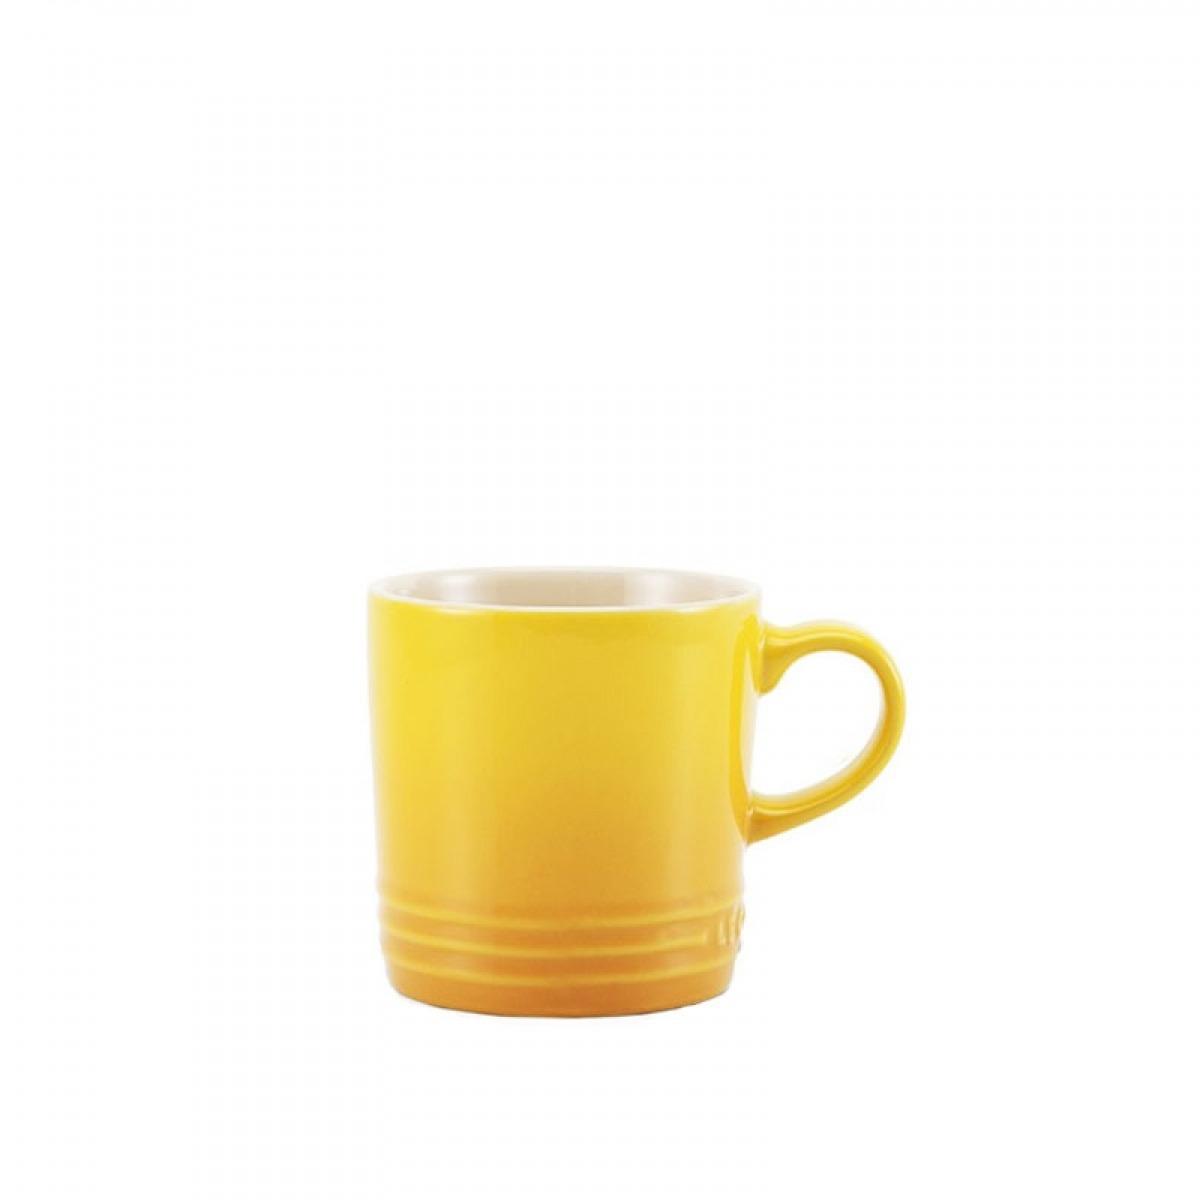 Caneca Espresso Amarelo Dijon Le Creuset